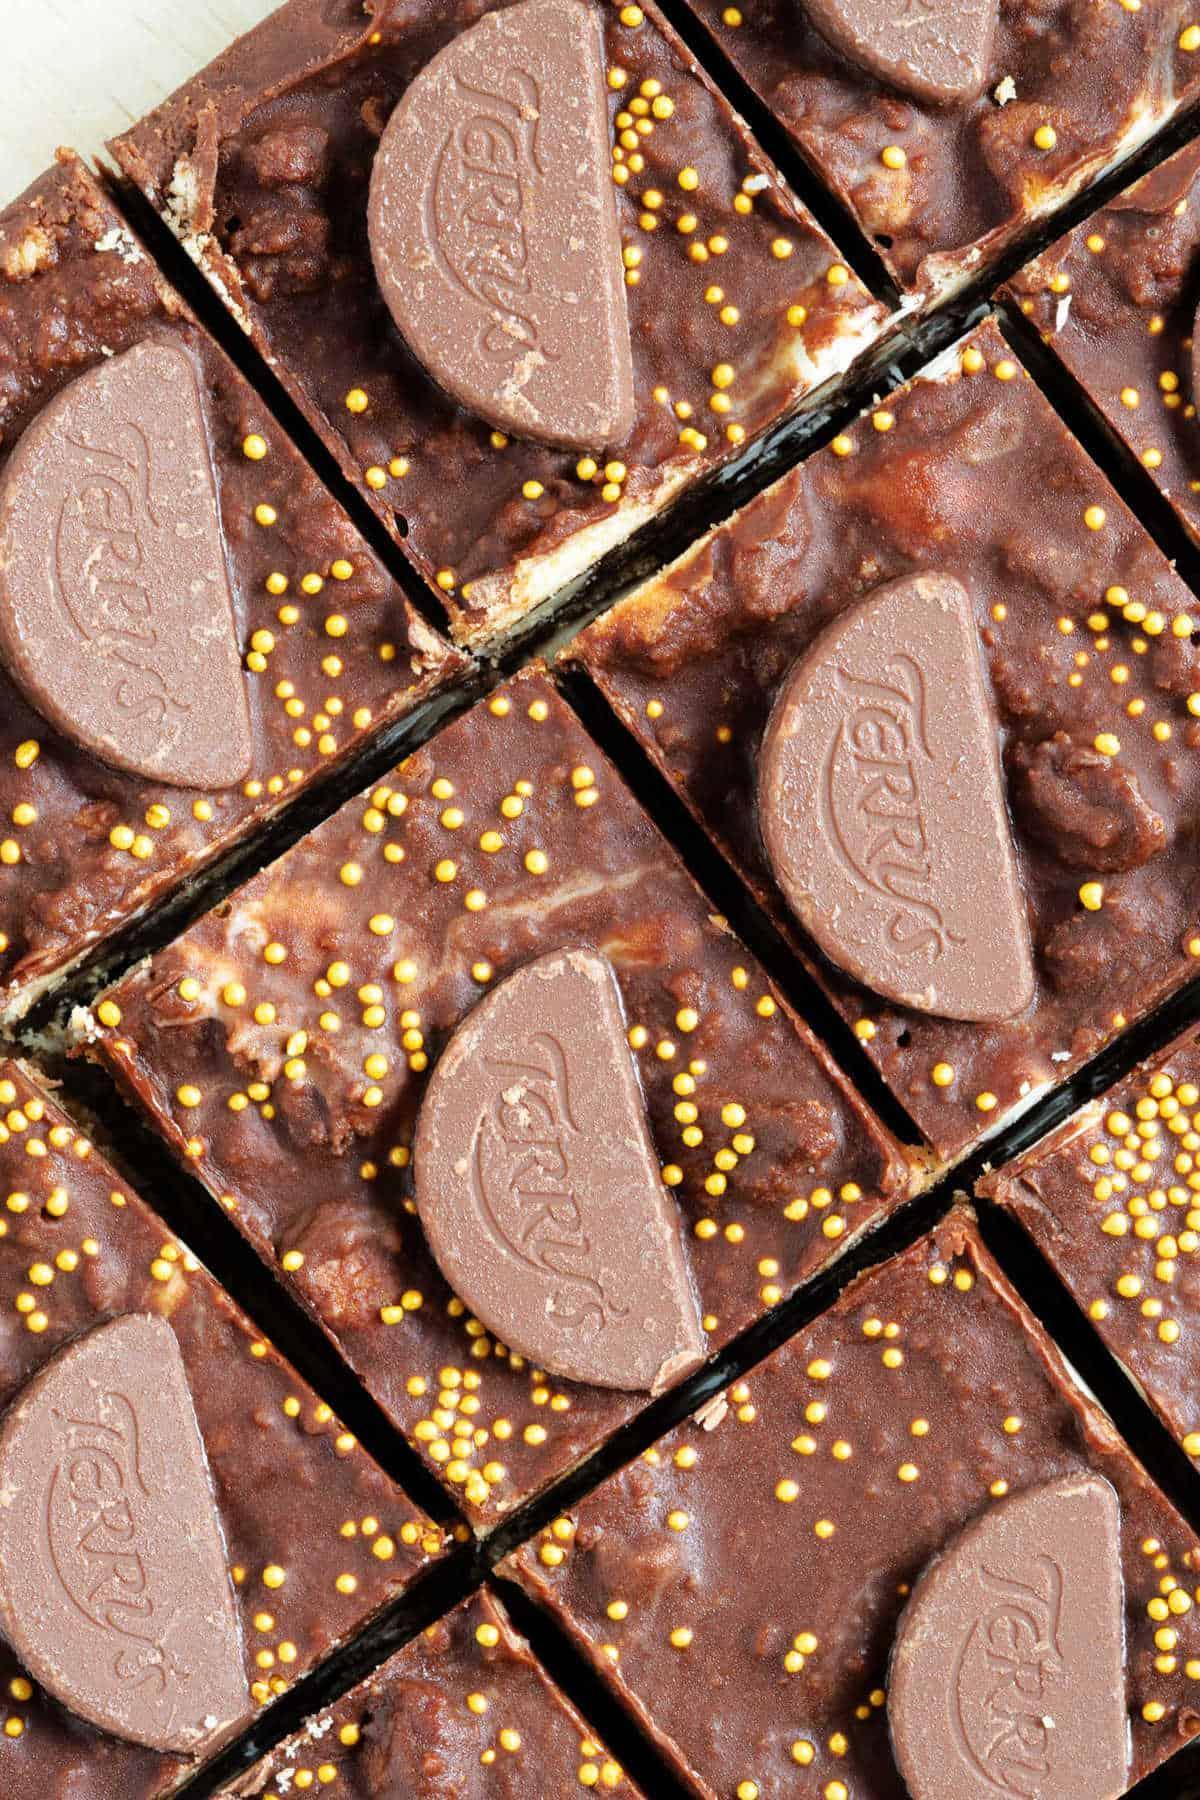 Sliced chocolate orange tiffin topped with chocolate orange minis.